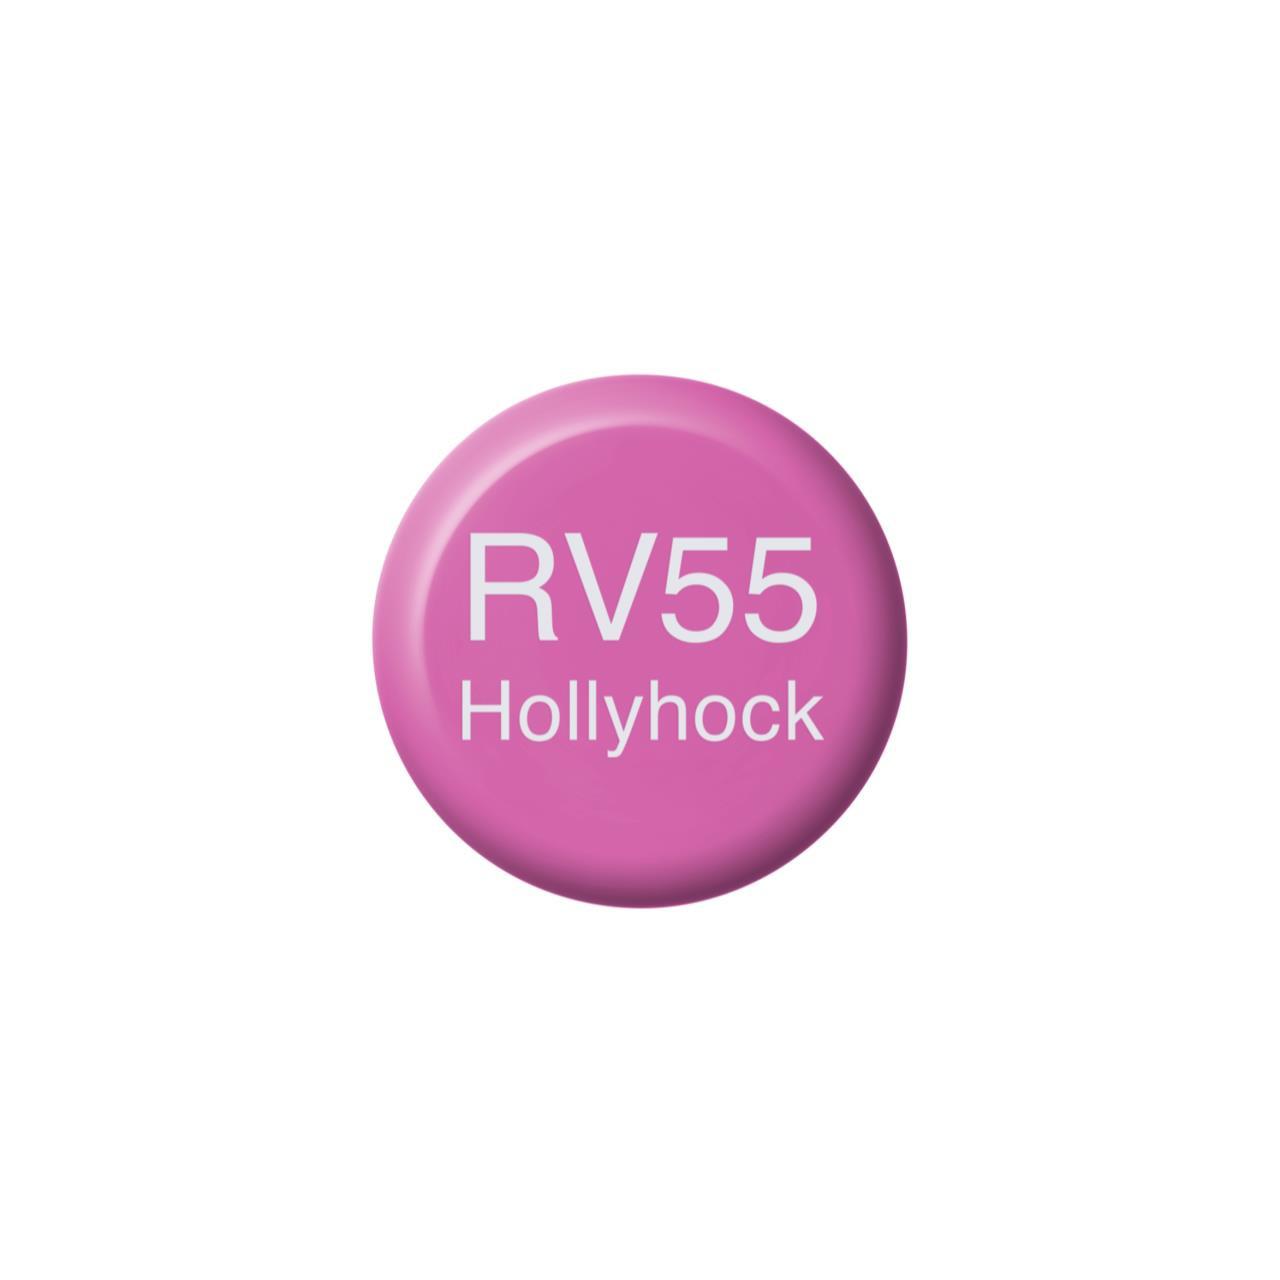 RV55 Hollyhock, Copic Ink - 4511338057872